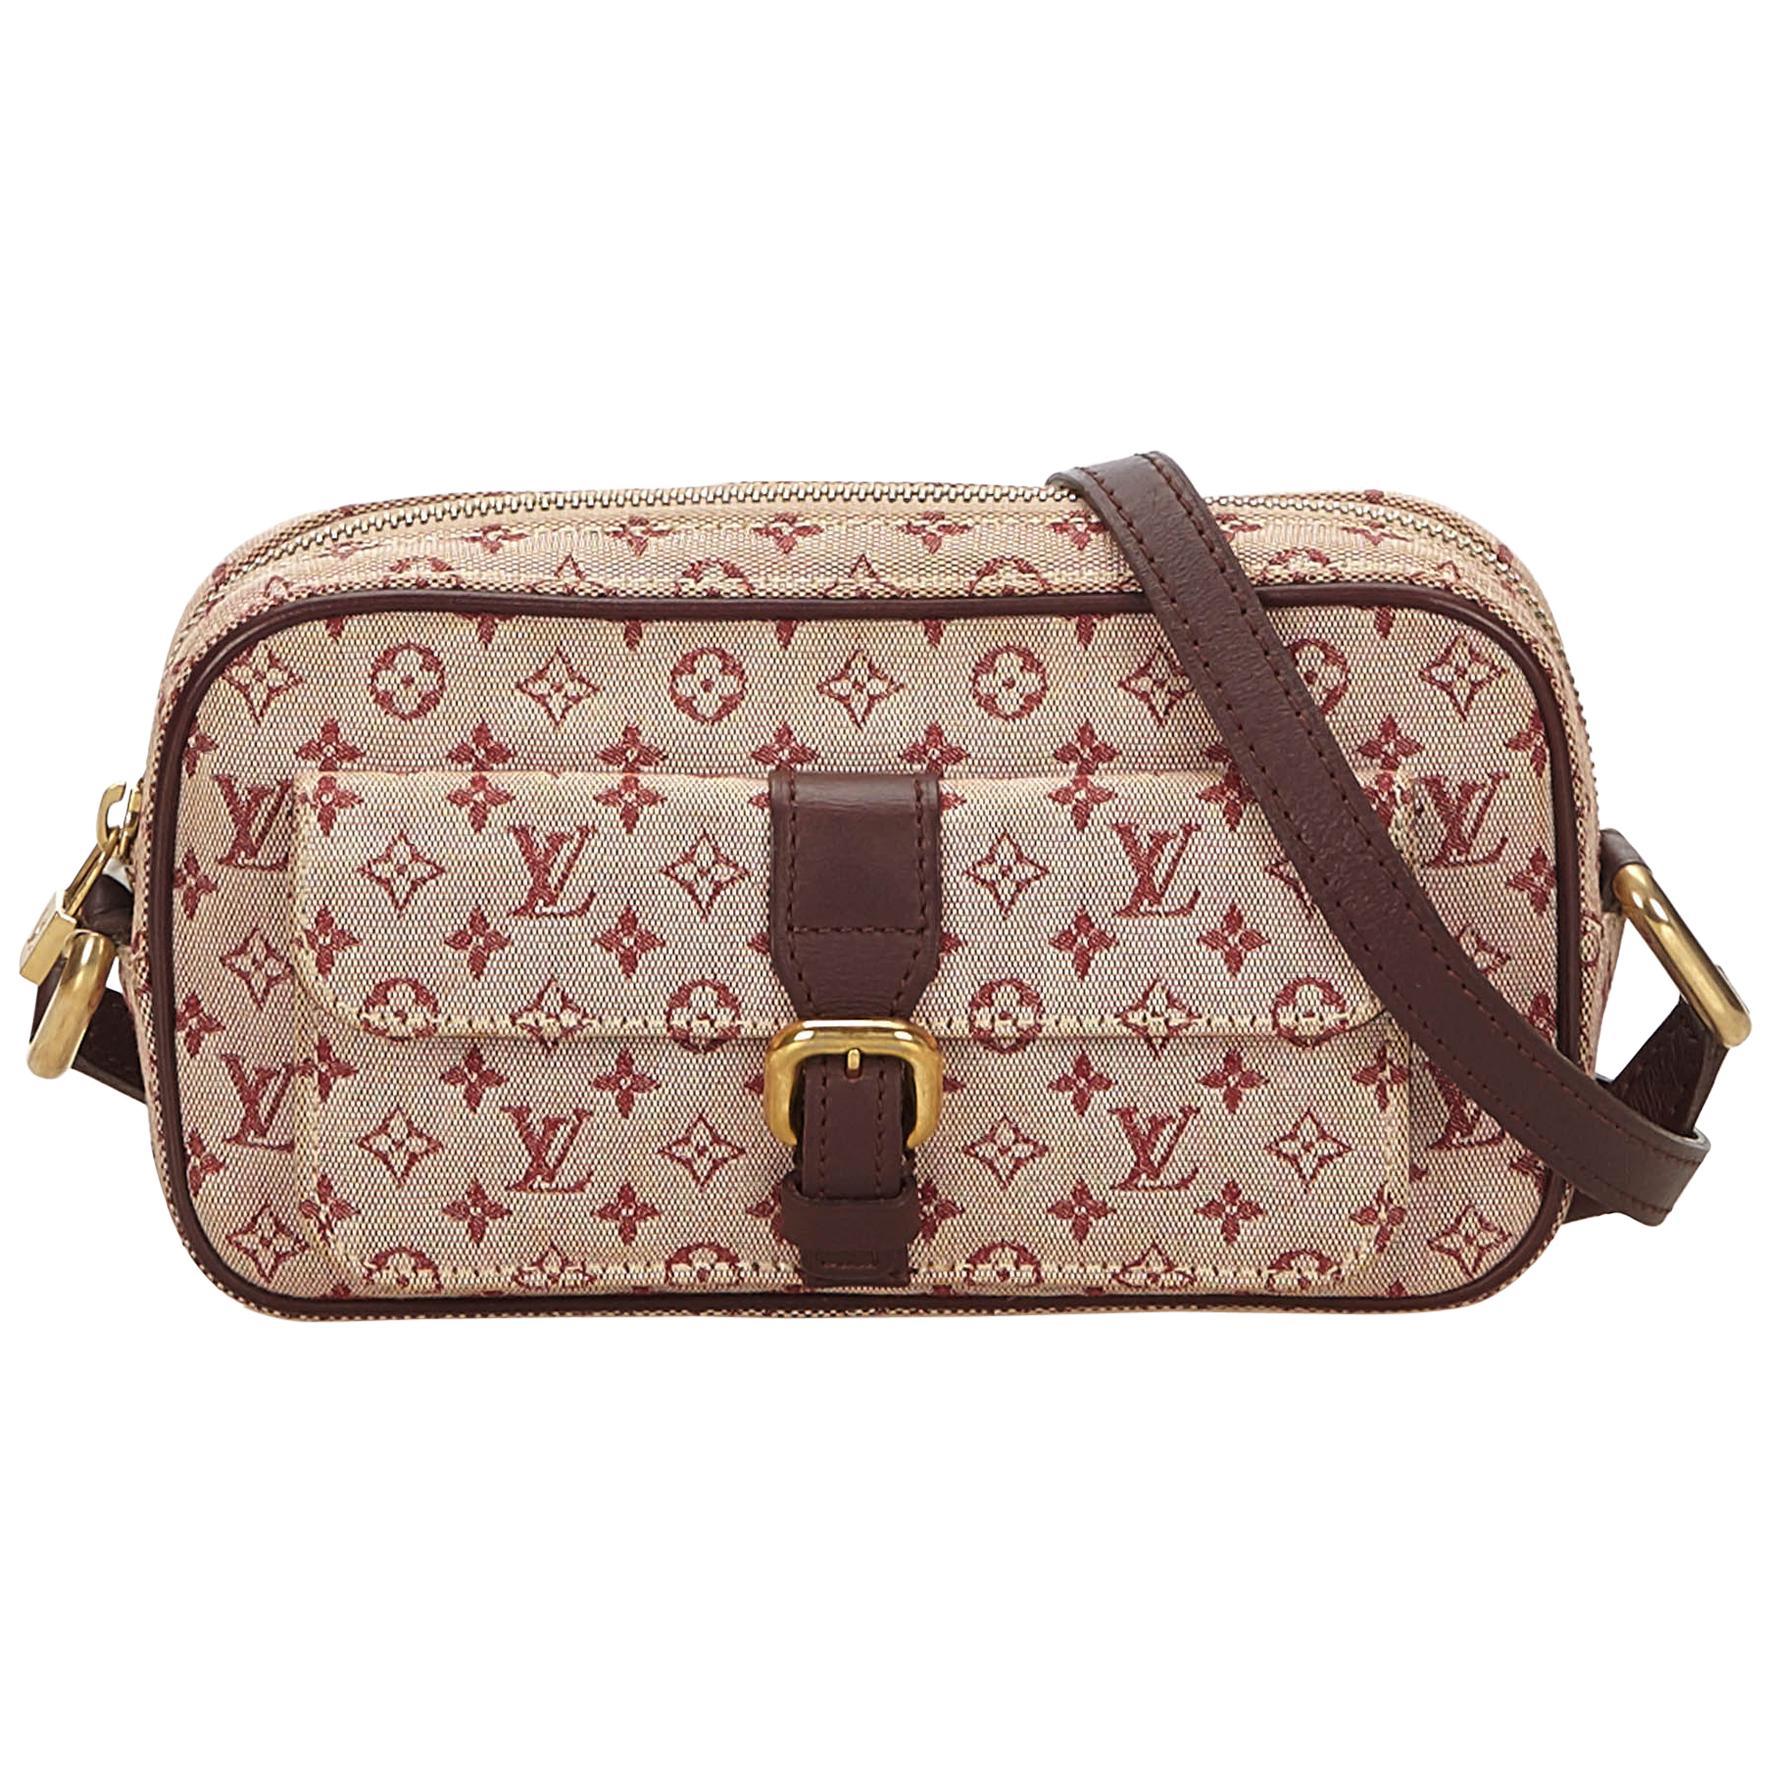 41c90a8d9489 Louis Vuitton Mini Lin Bags - 35 For Sale on 1stdibs